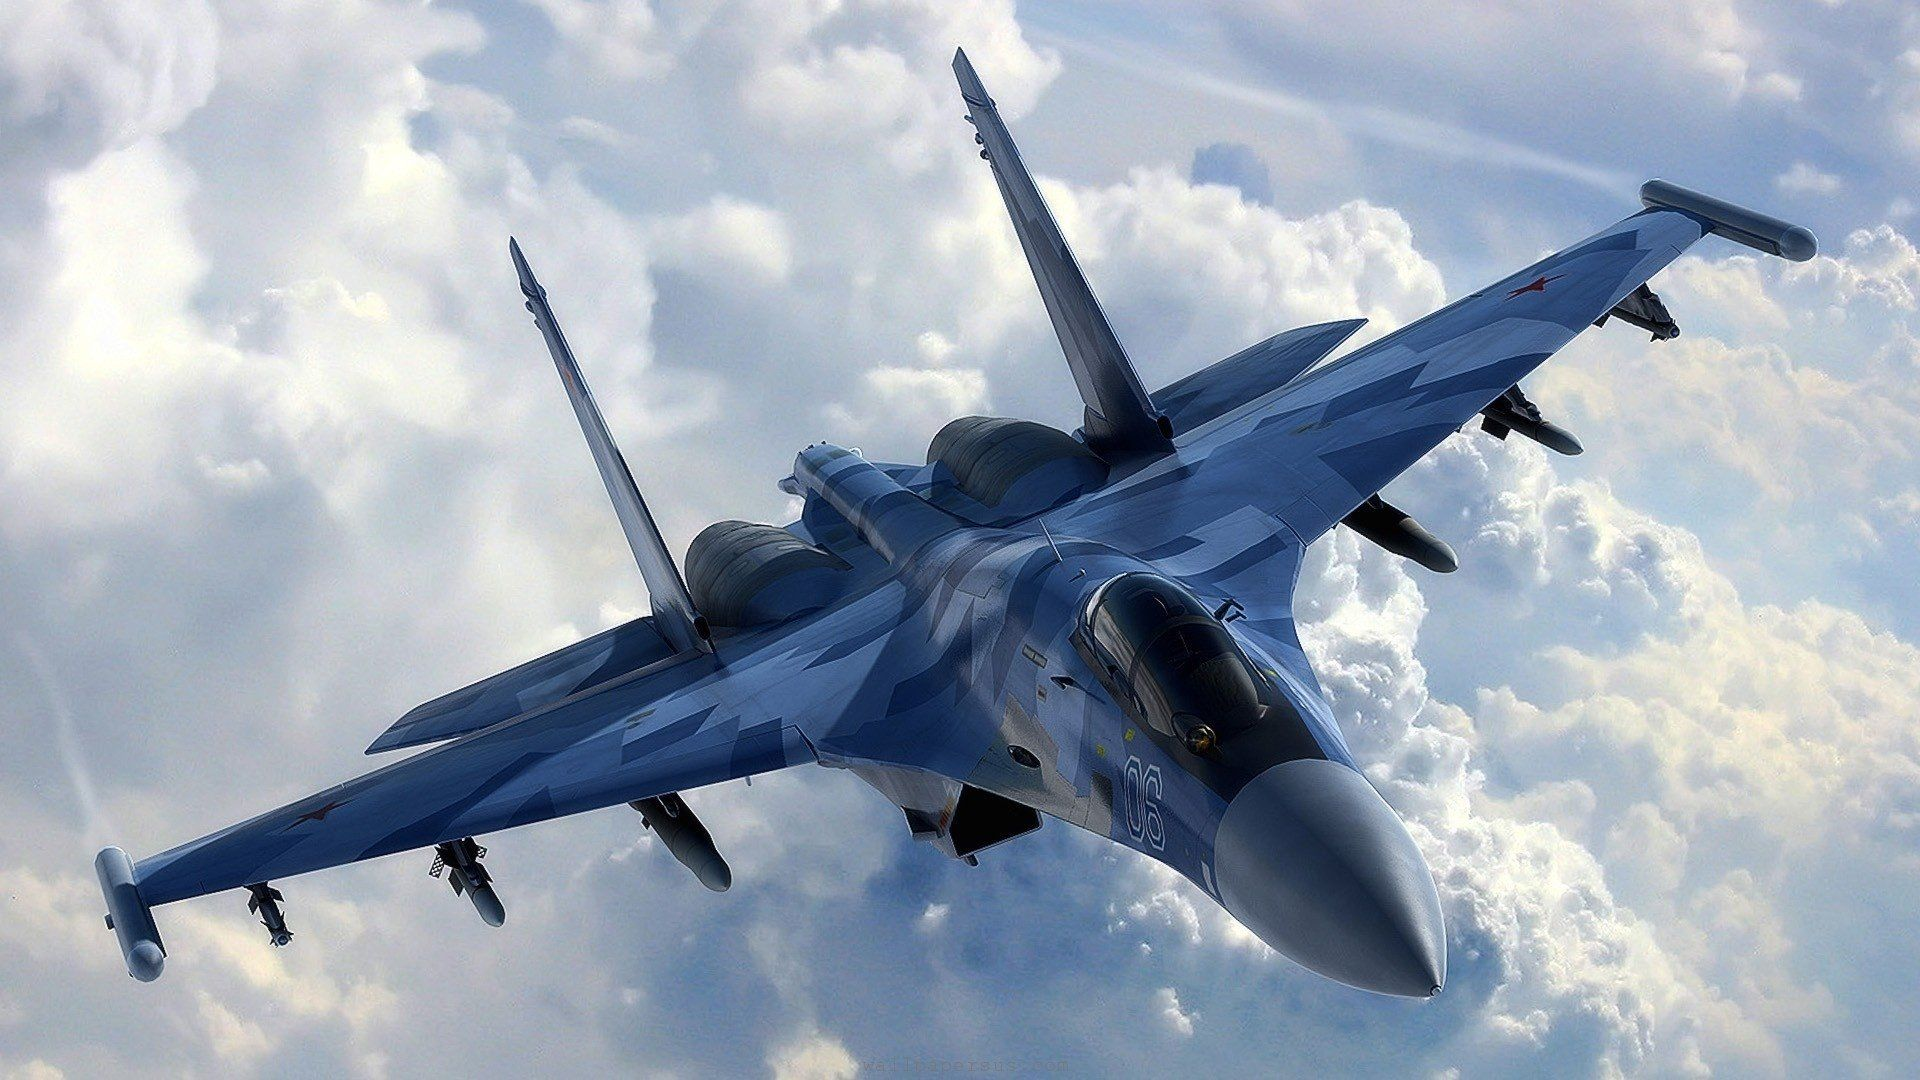 Обои Mcdonnell douglas, истребитель, Самолёт, eagle, Облака. Авиация foto 14